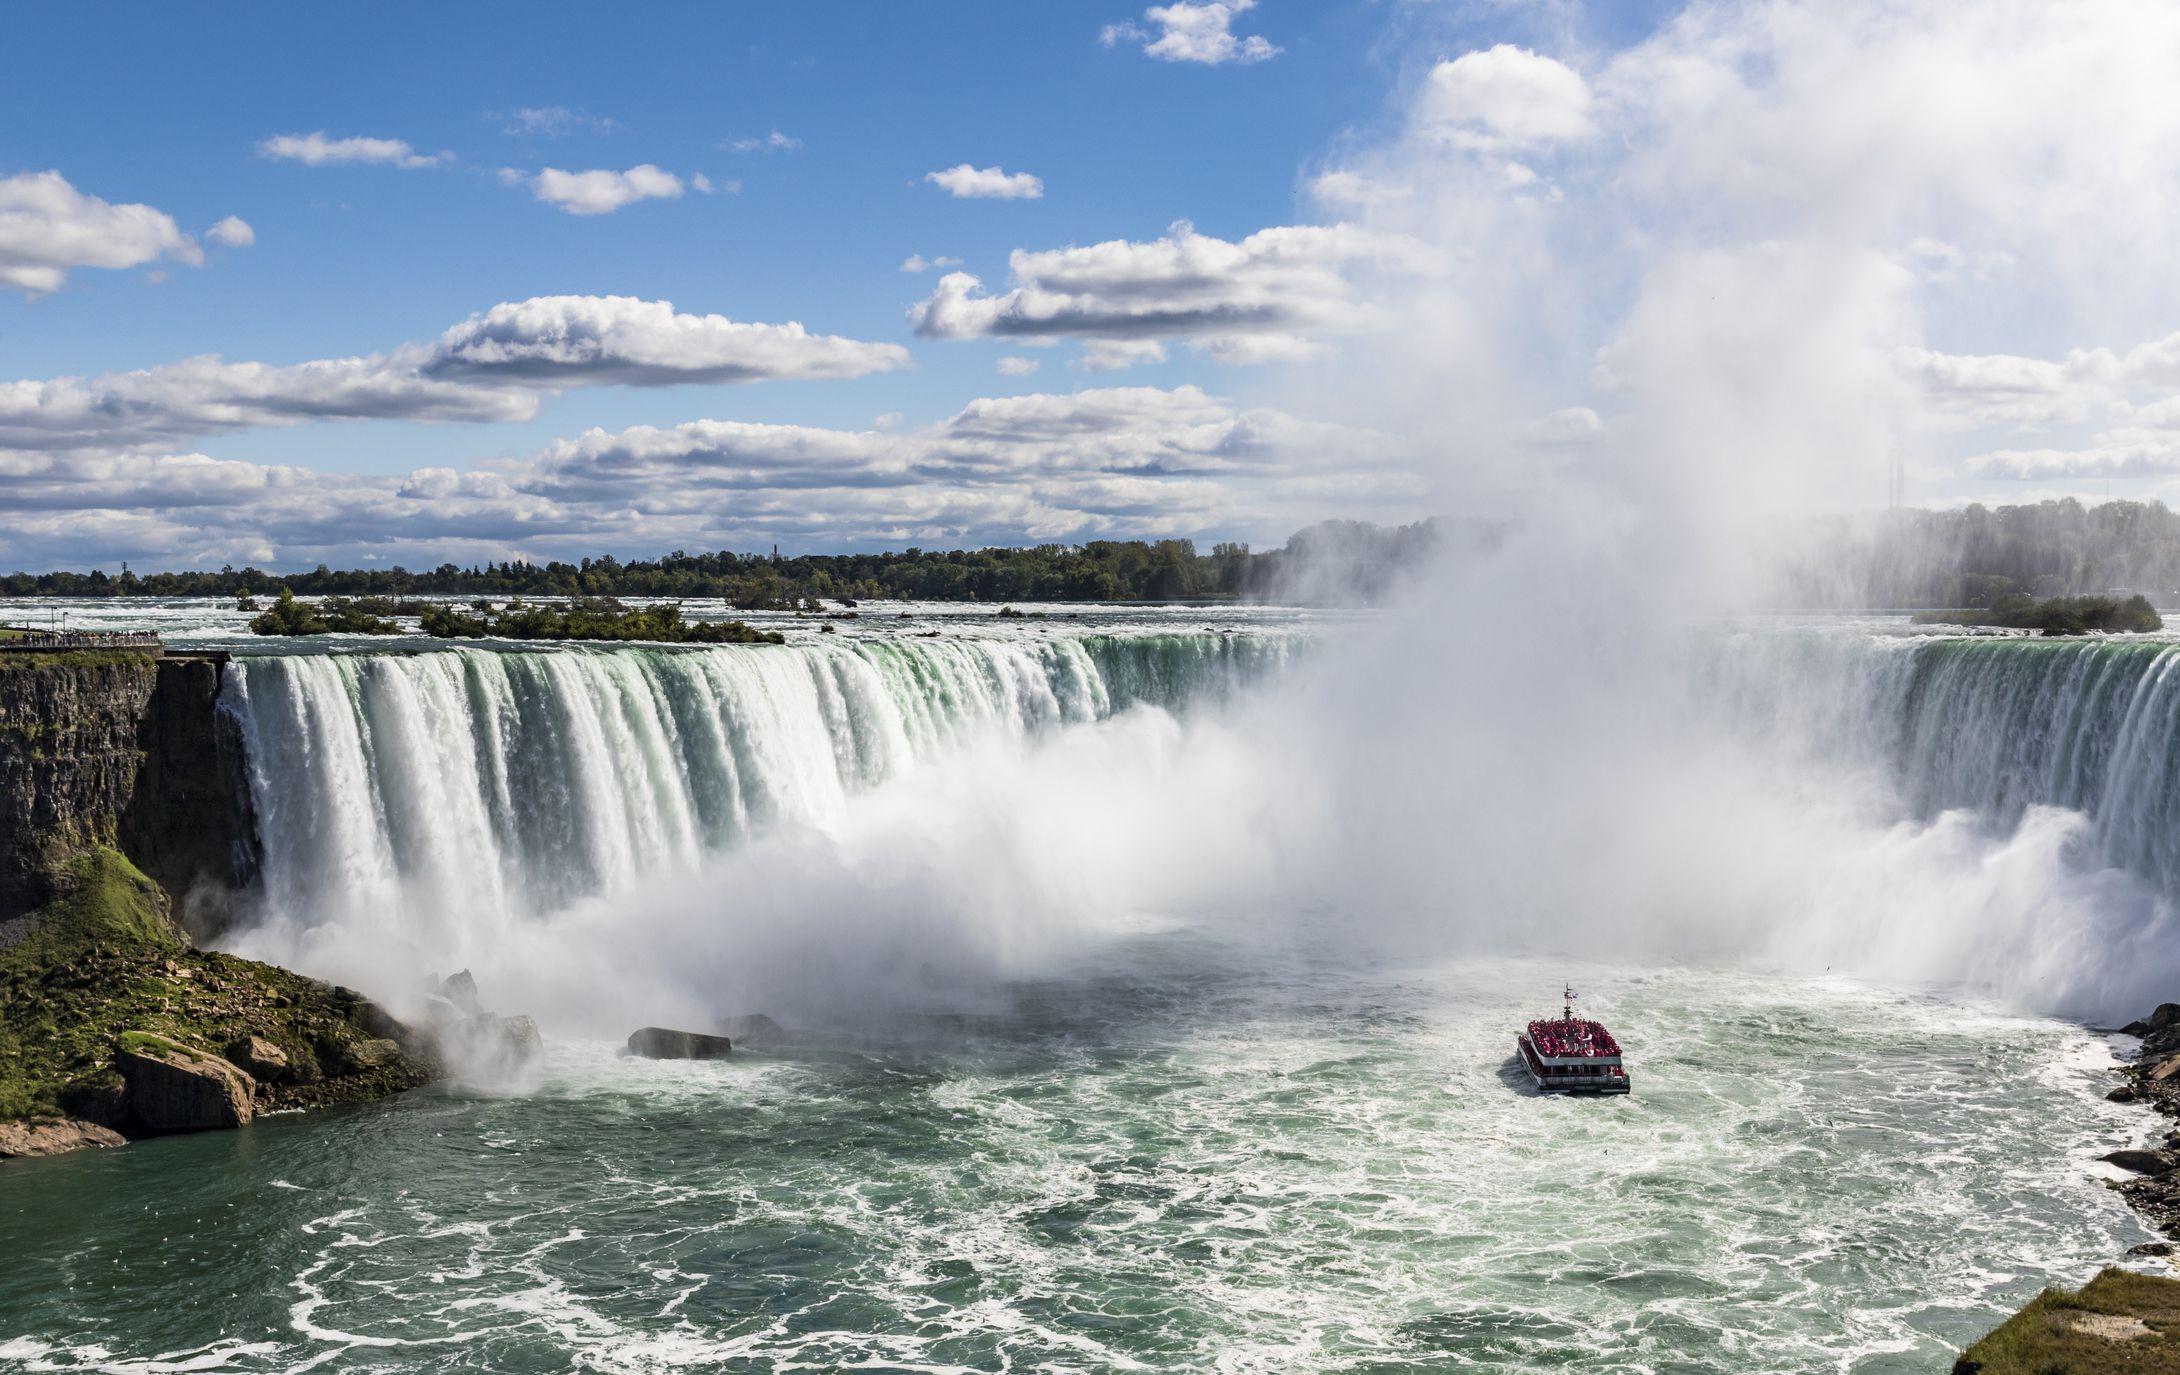 Travel Dan Pengunjung Panduan Untuk Air Terjun Niagara Kanada